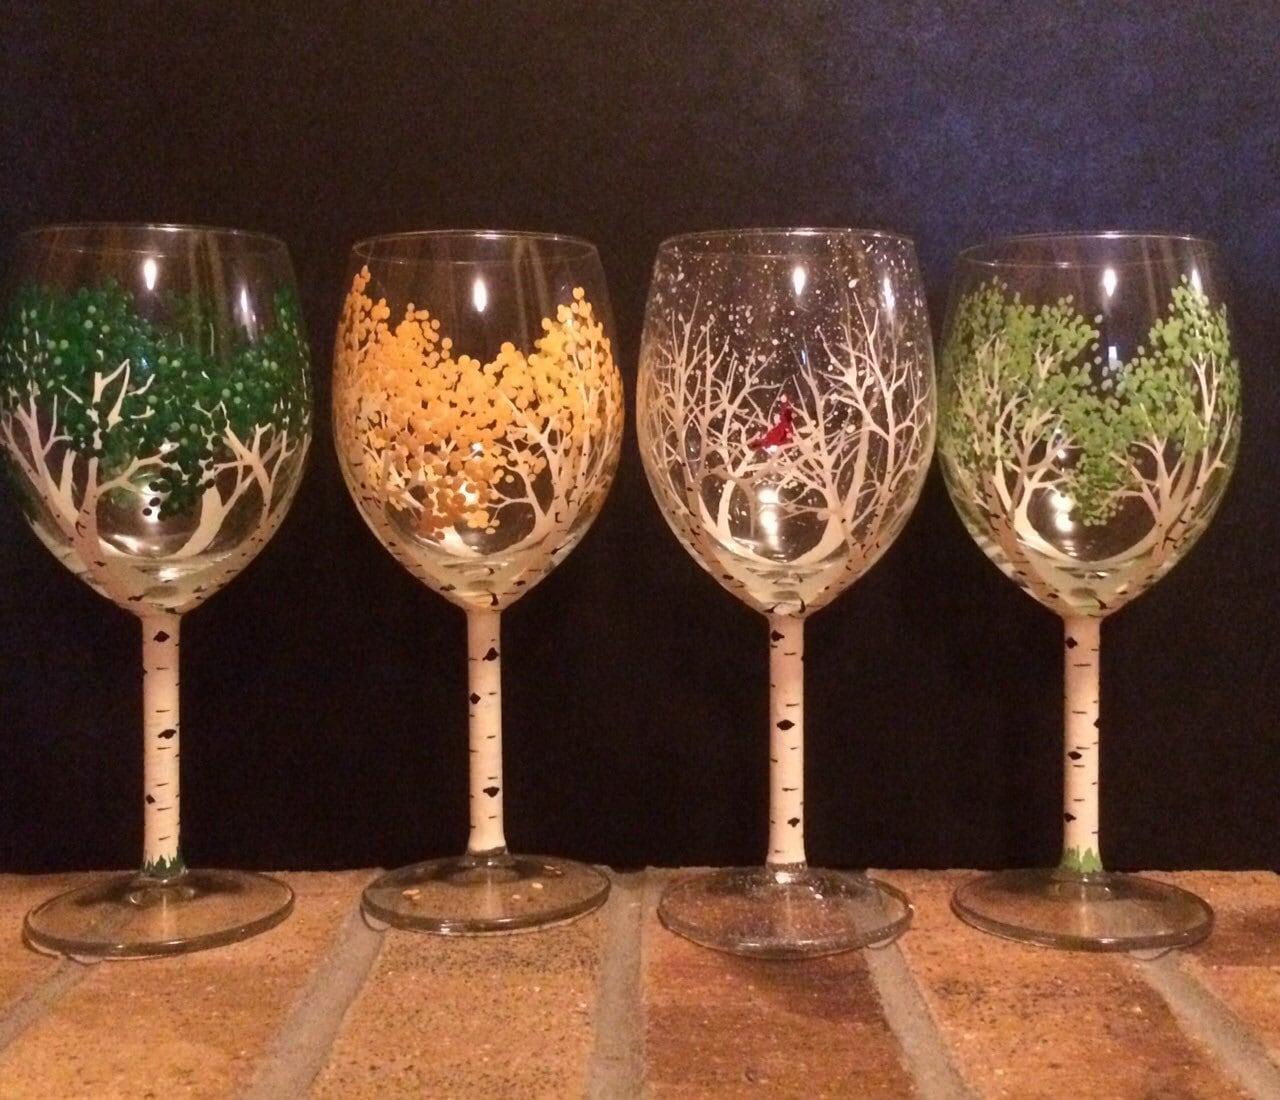 4 season hand painted wine glasses aspen trees small size for Painted wine glasses